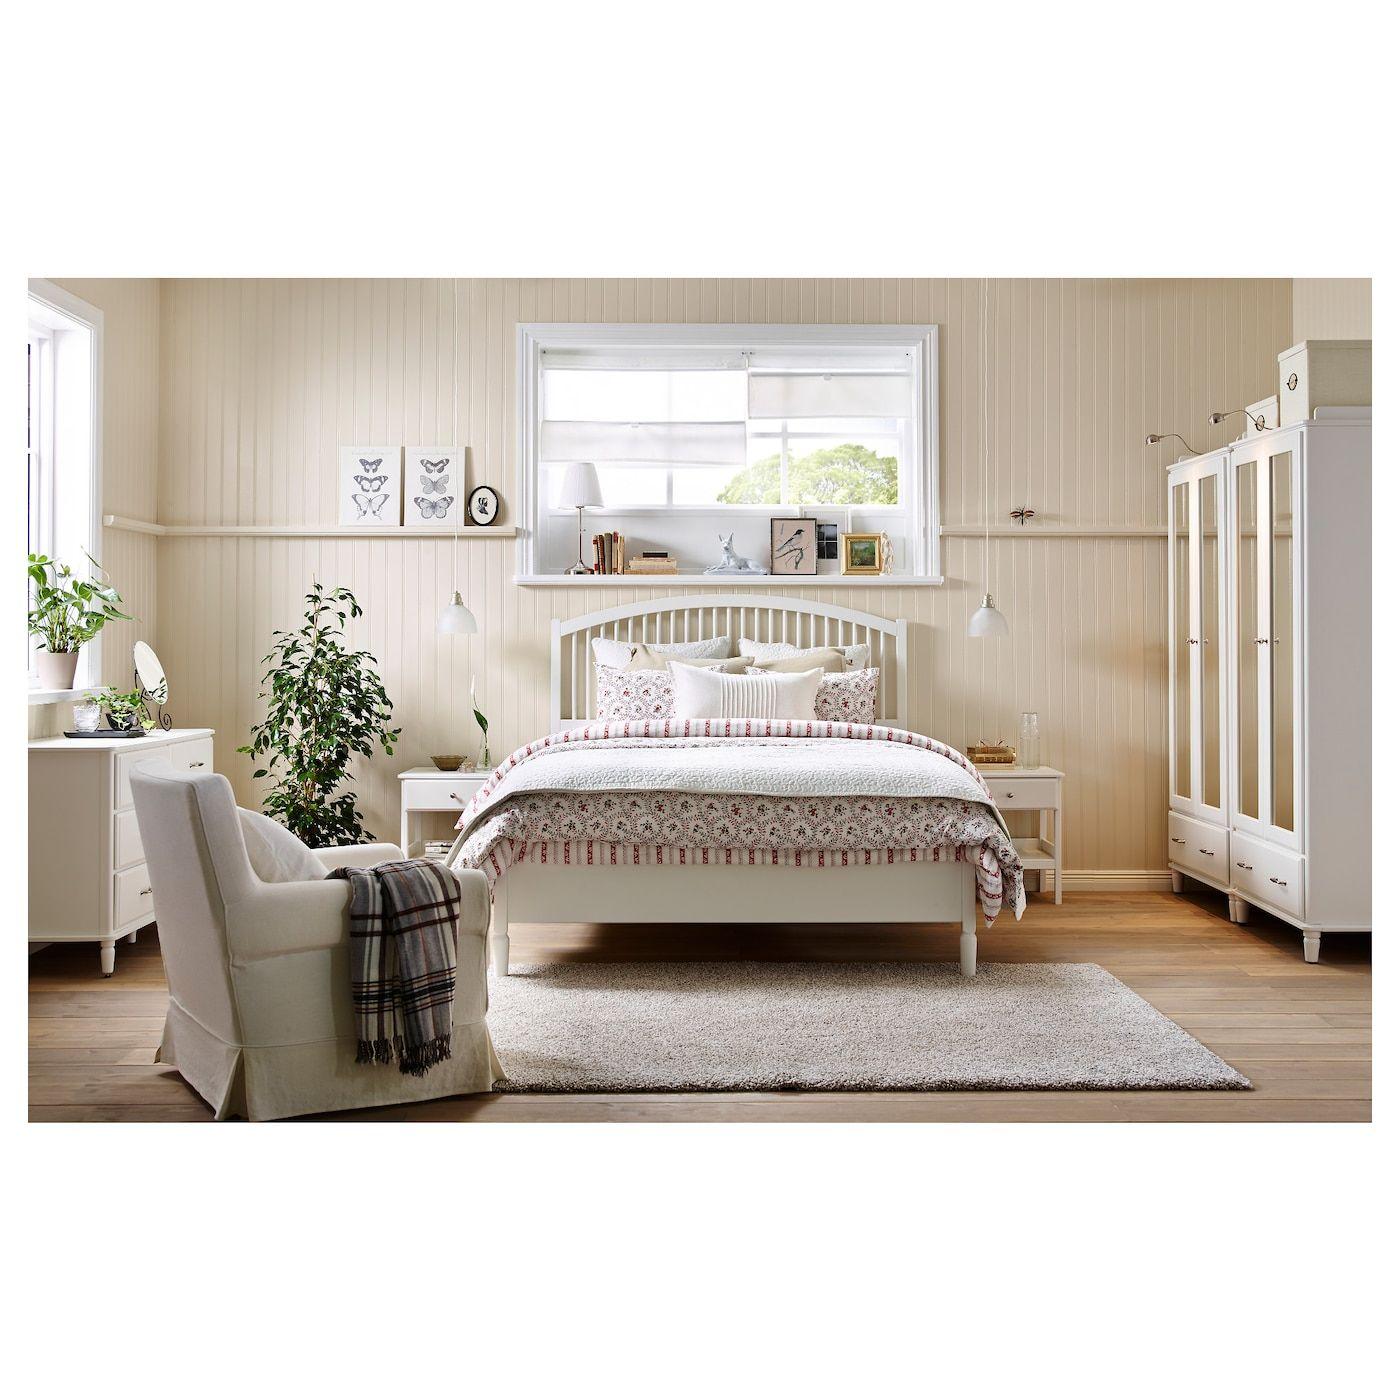 TYSSEDAL Bed frame, white, Eidfjord, King IKEA in 2020